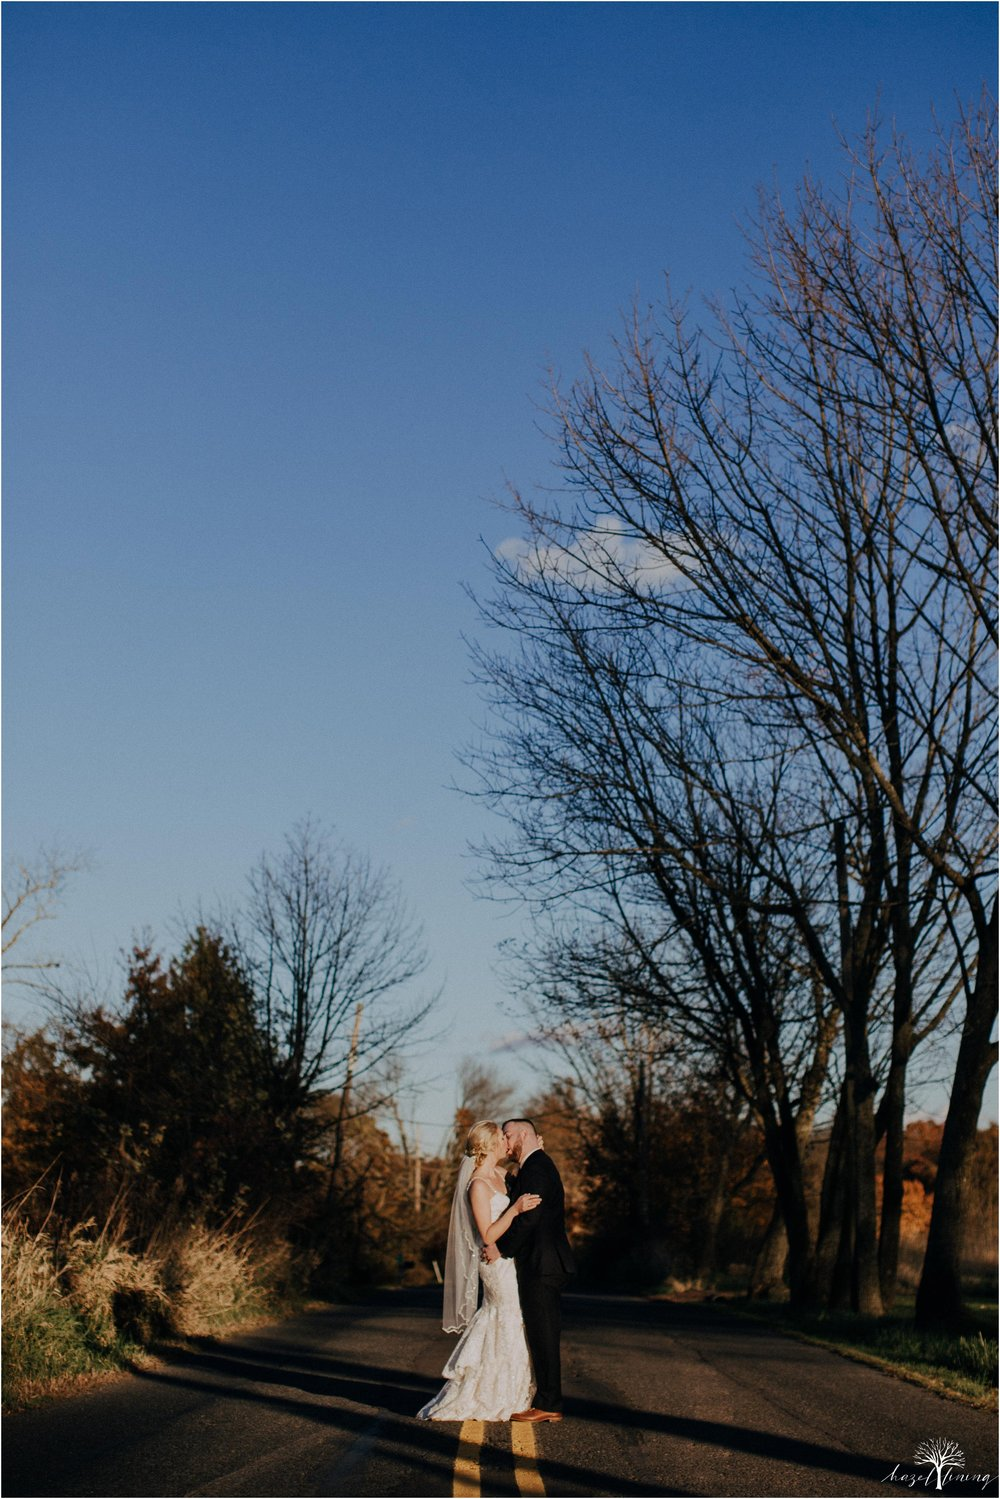 briana-krans-greg-johnston-farm-bakery-and-events-fall-wedding_0110.jpg